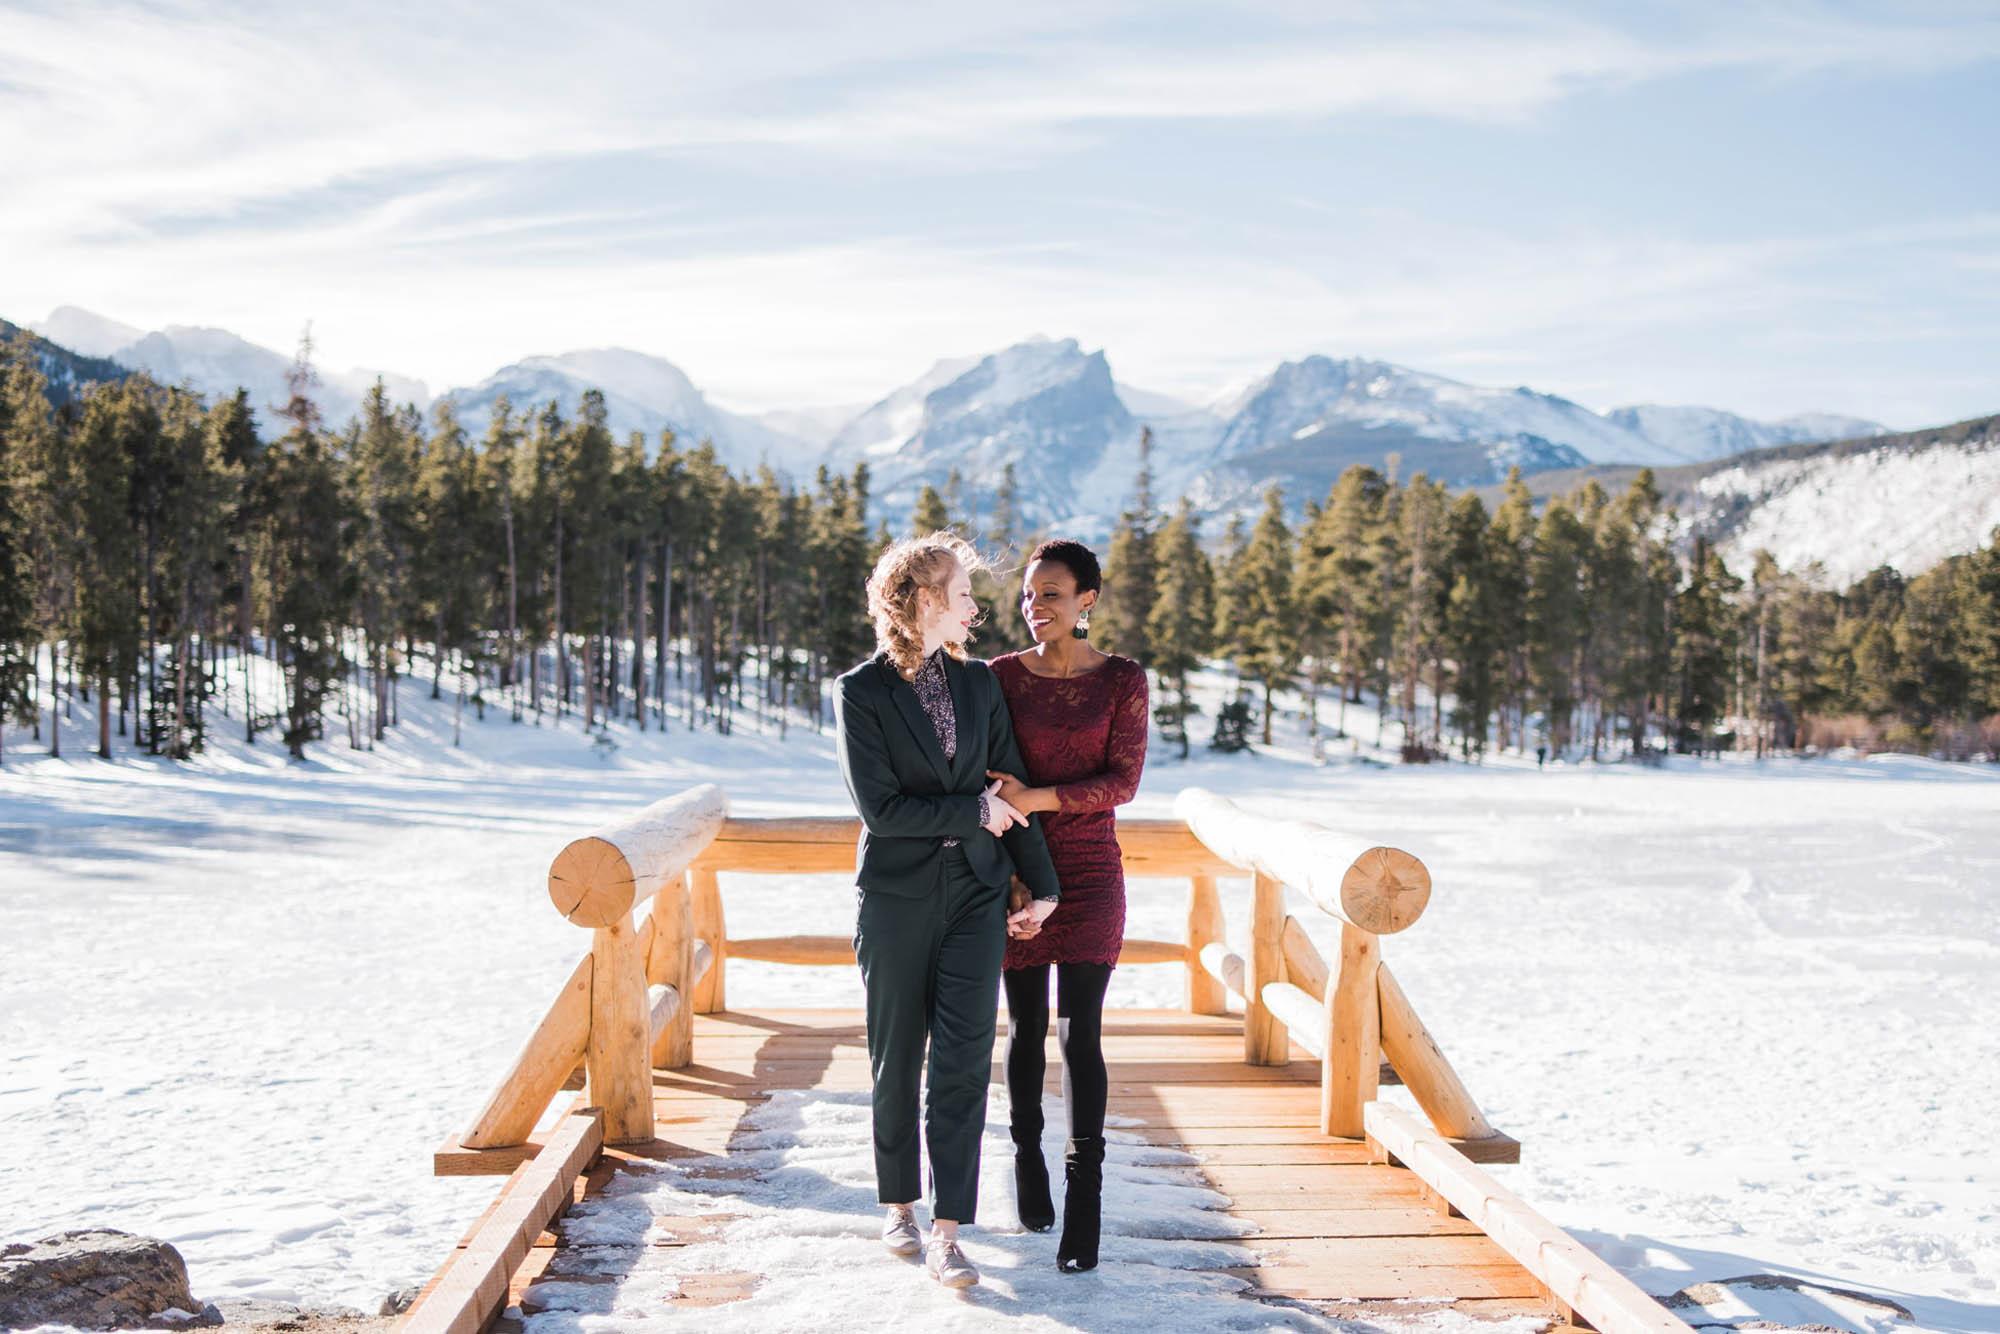 Bailey Cross Photography - Colorado Wedding Photography - Dancing With Her (2)